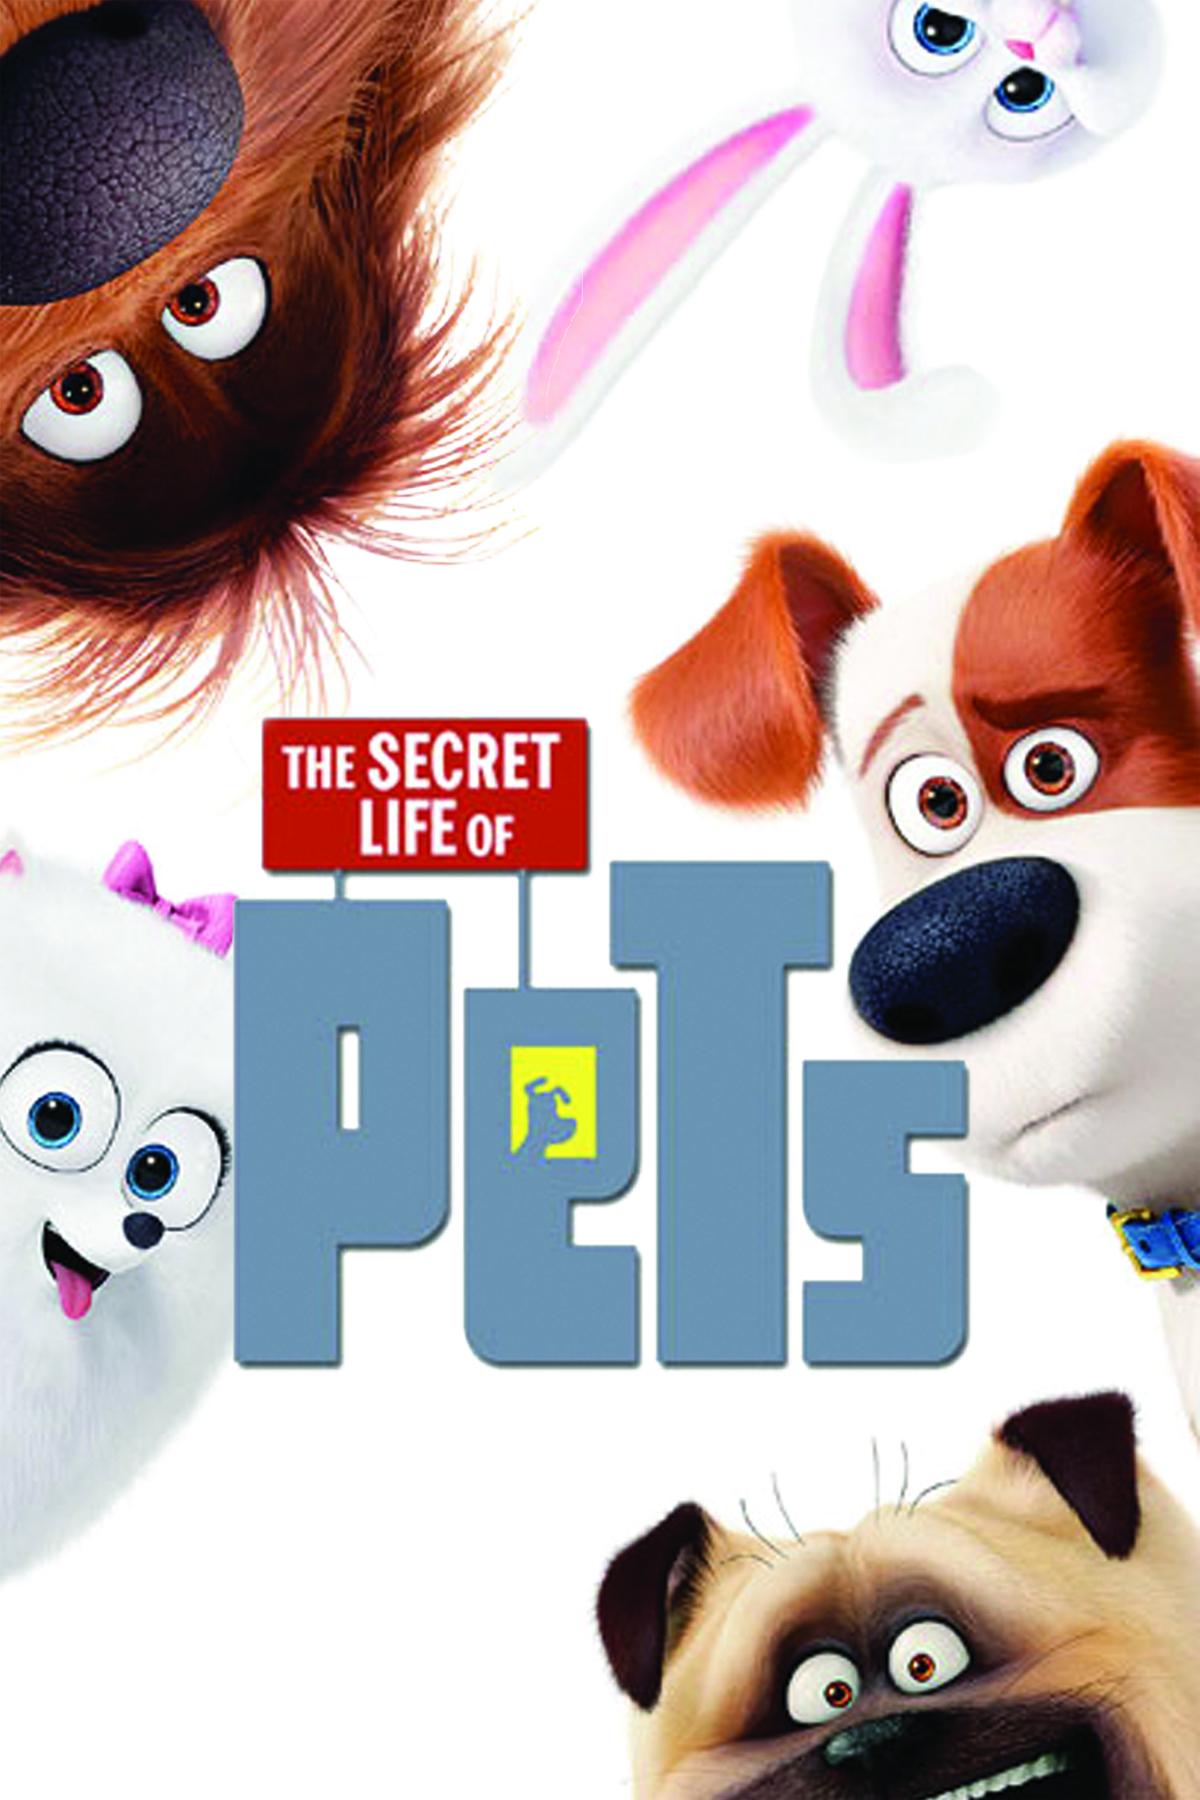 The Secret Life of Pets • PG